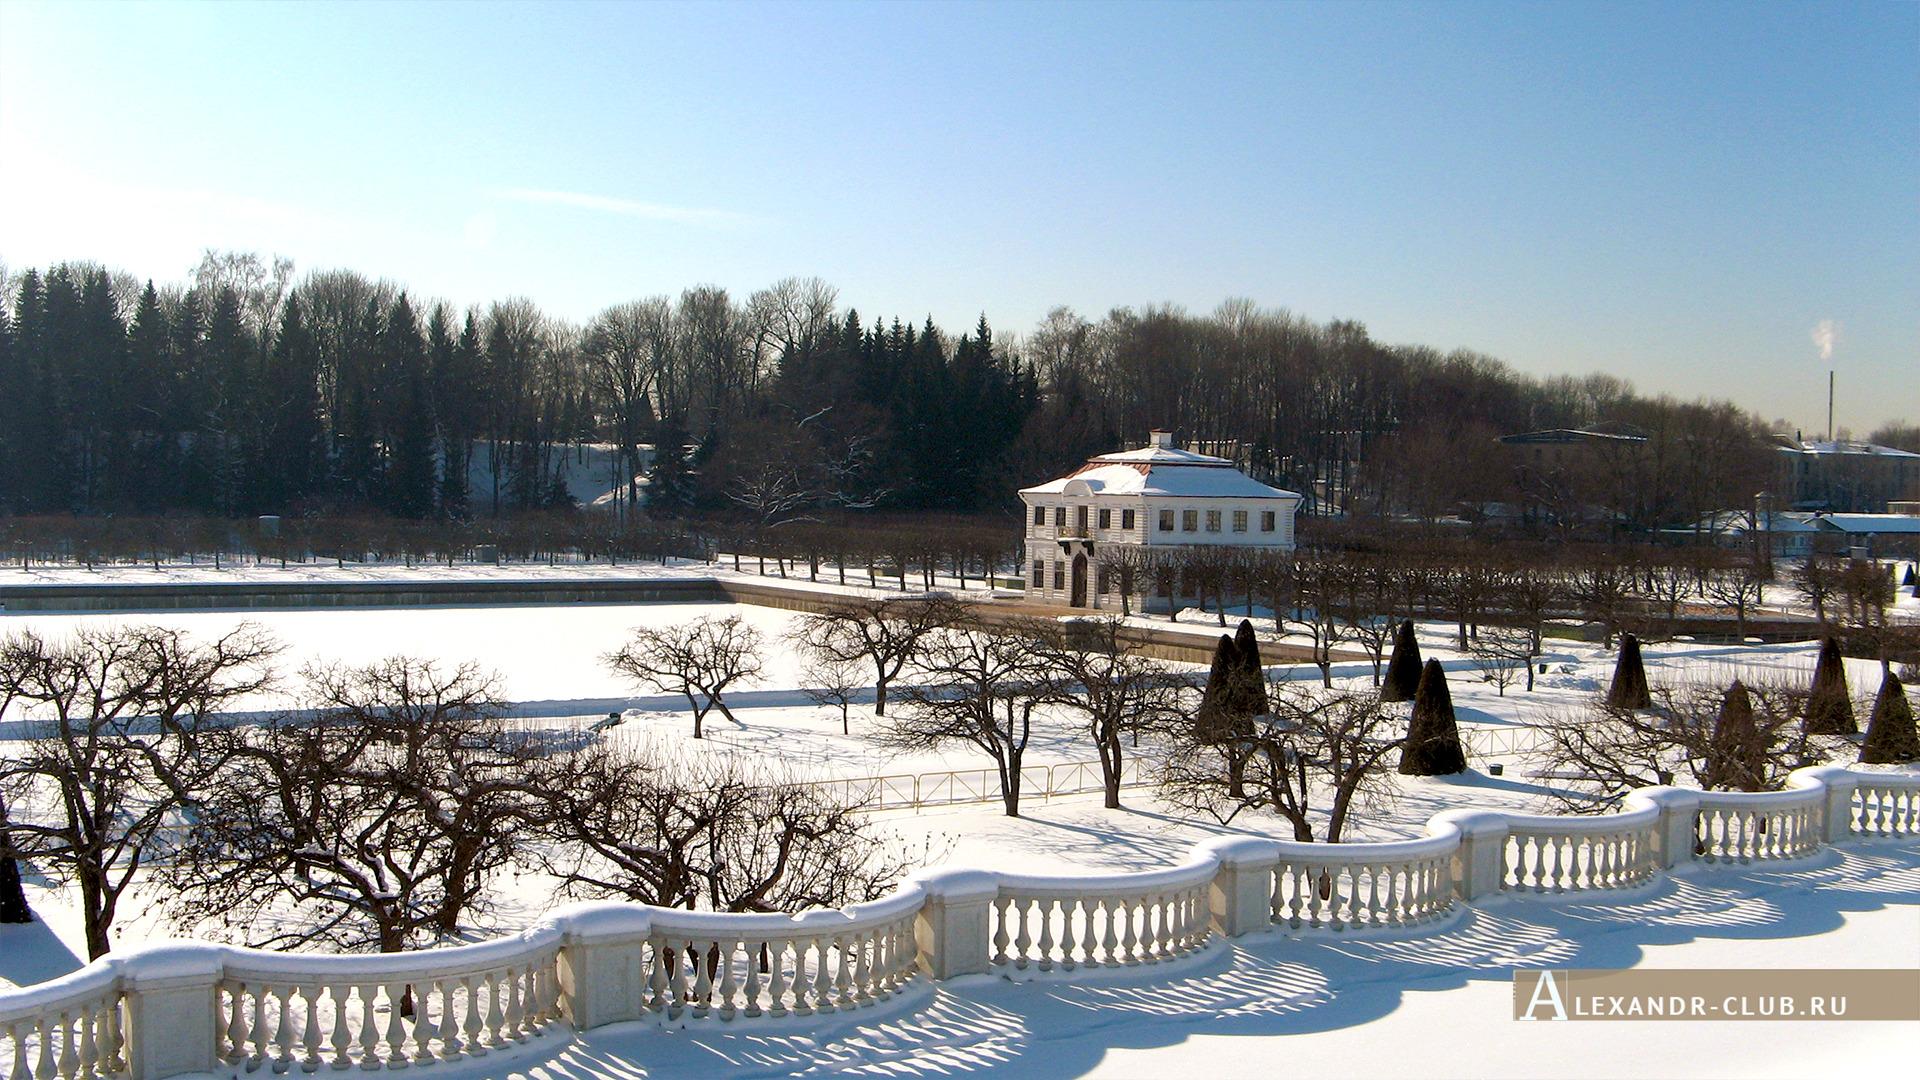 Петергоф, зима, Нижний парк, Марлинский пруд и дворец Марли – 3